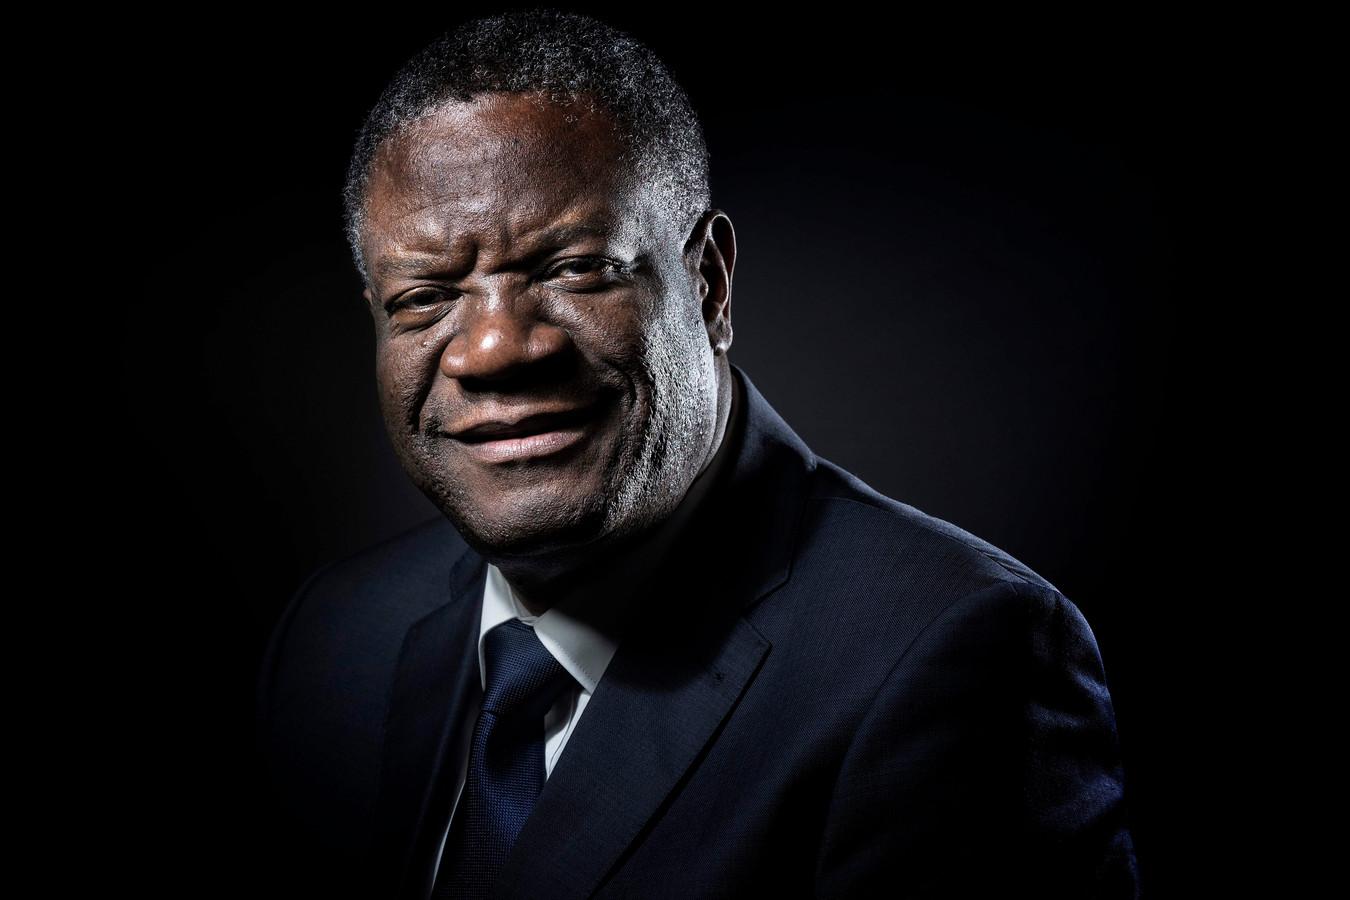 Le Dr Denis Mukwege.